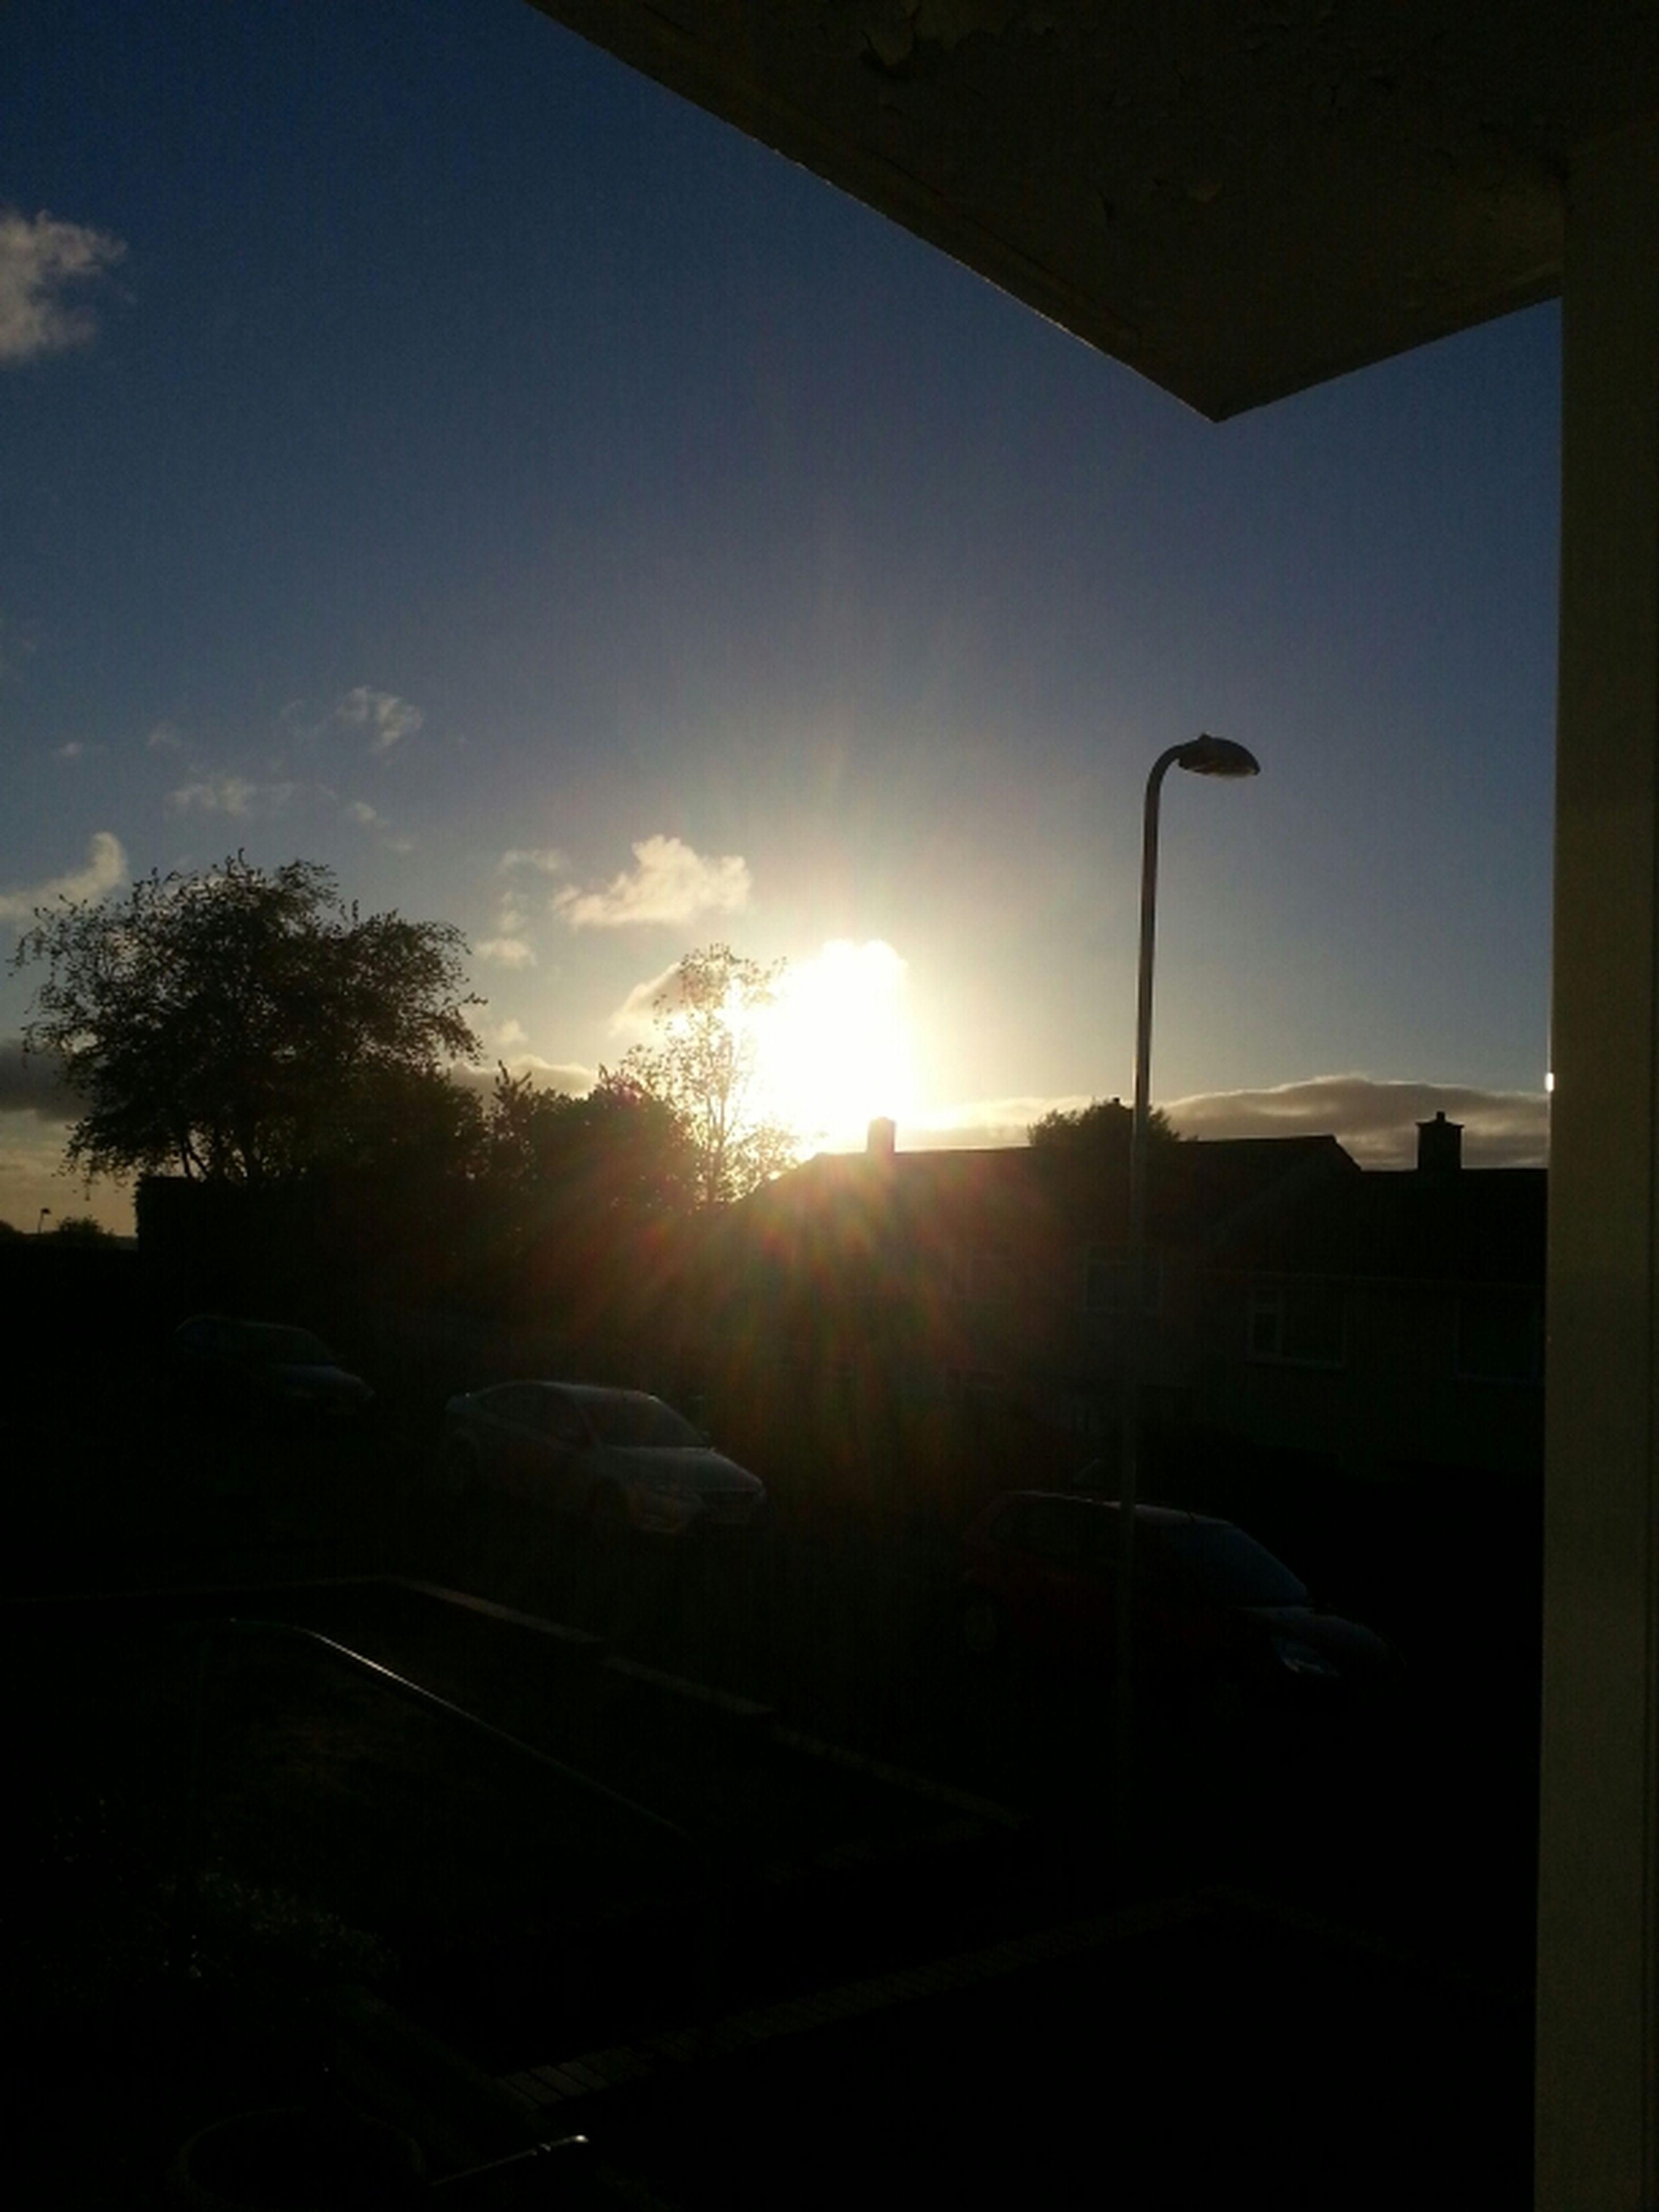 sun, silhouette, sunlight, sunset, sunbeam, car, street light, tree, sky, transportation, land vehicle, built structure, lens flare, architecture, street, building exterior, road, mode of transport, clear sky, window